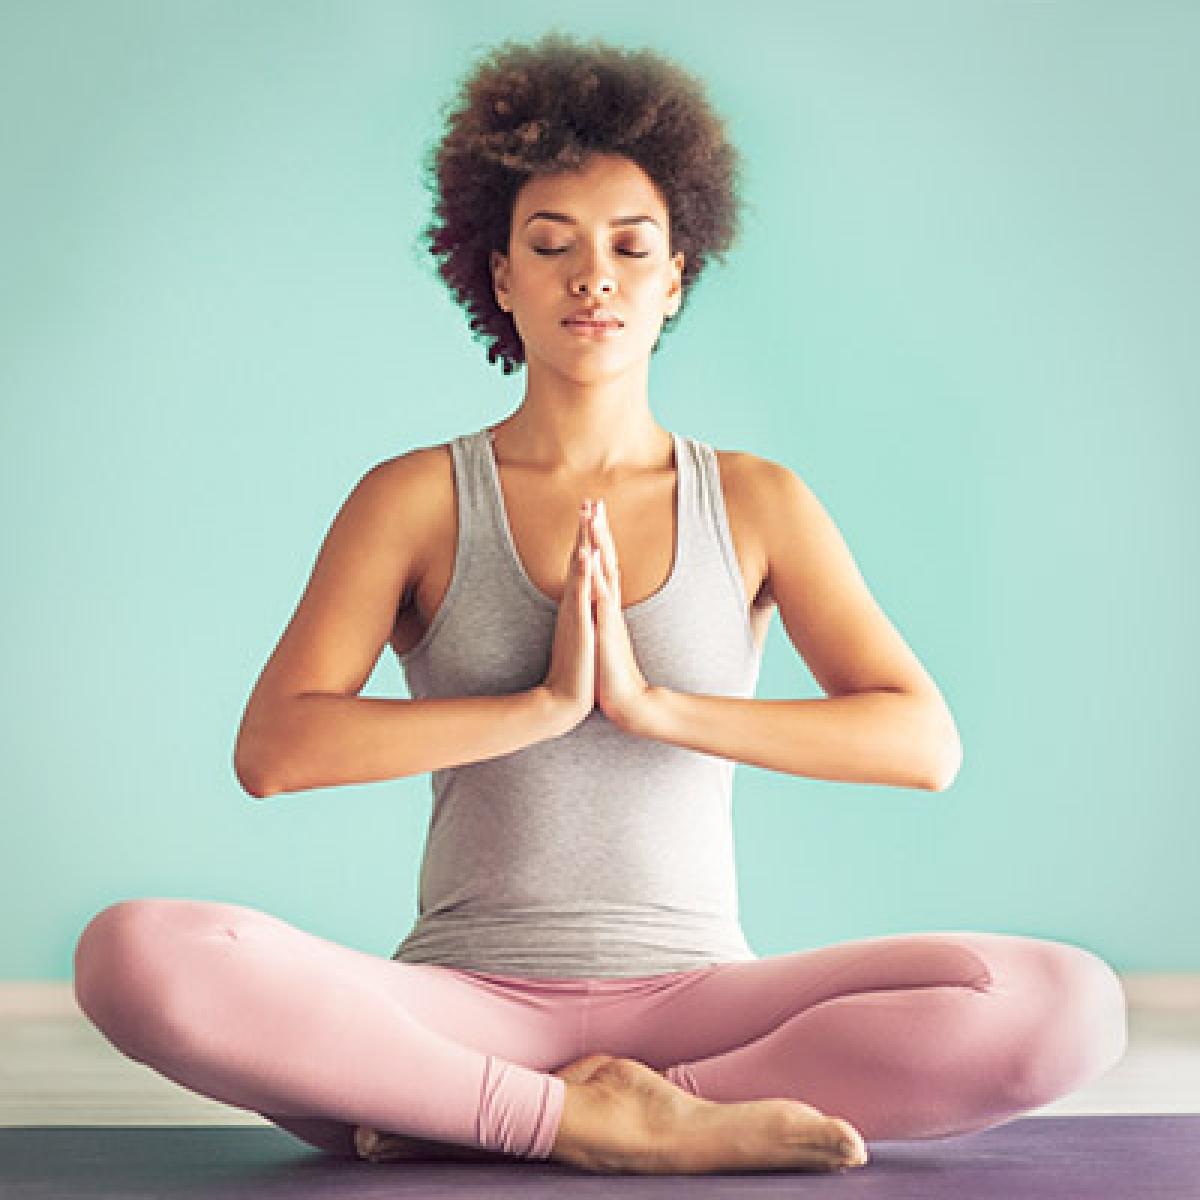 Meditation, sea salt help bring positivity at home